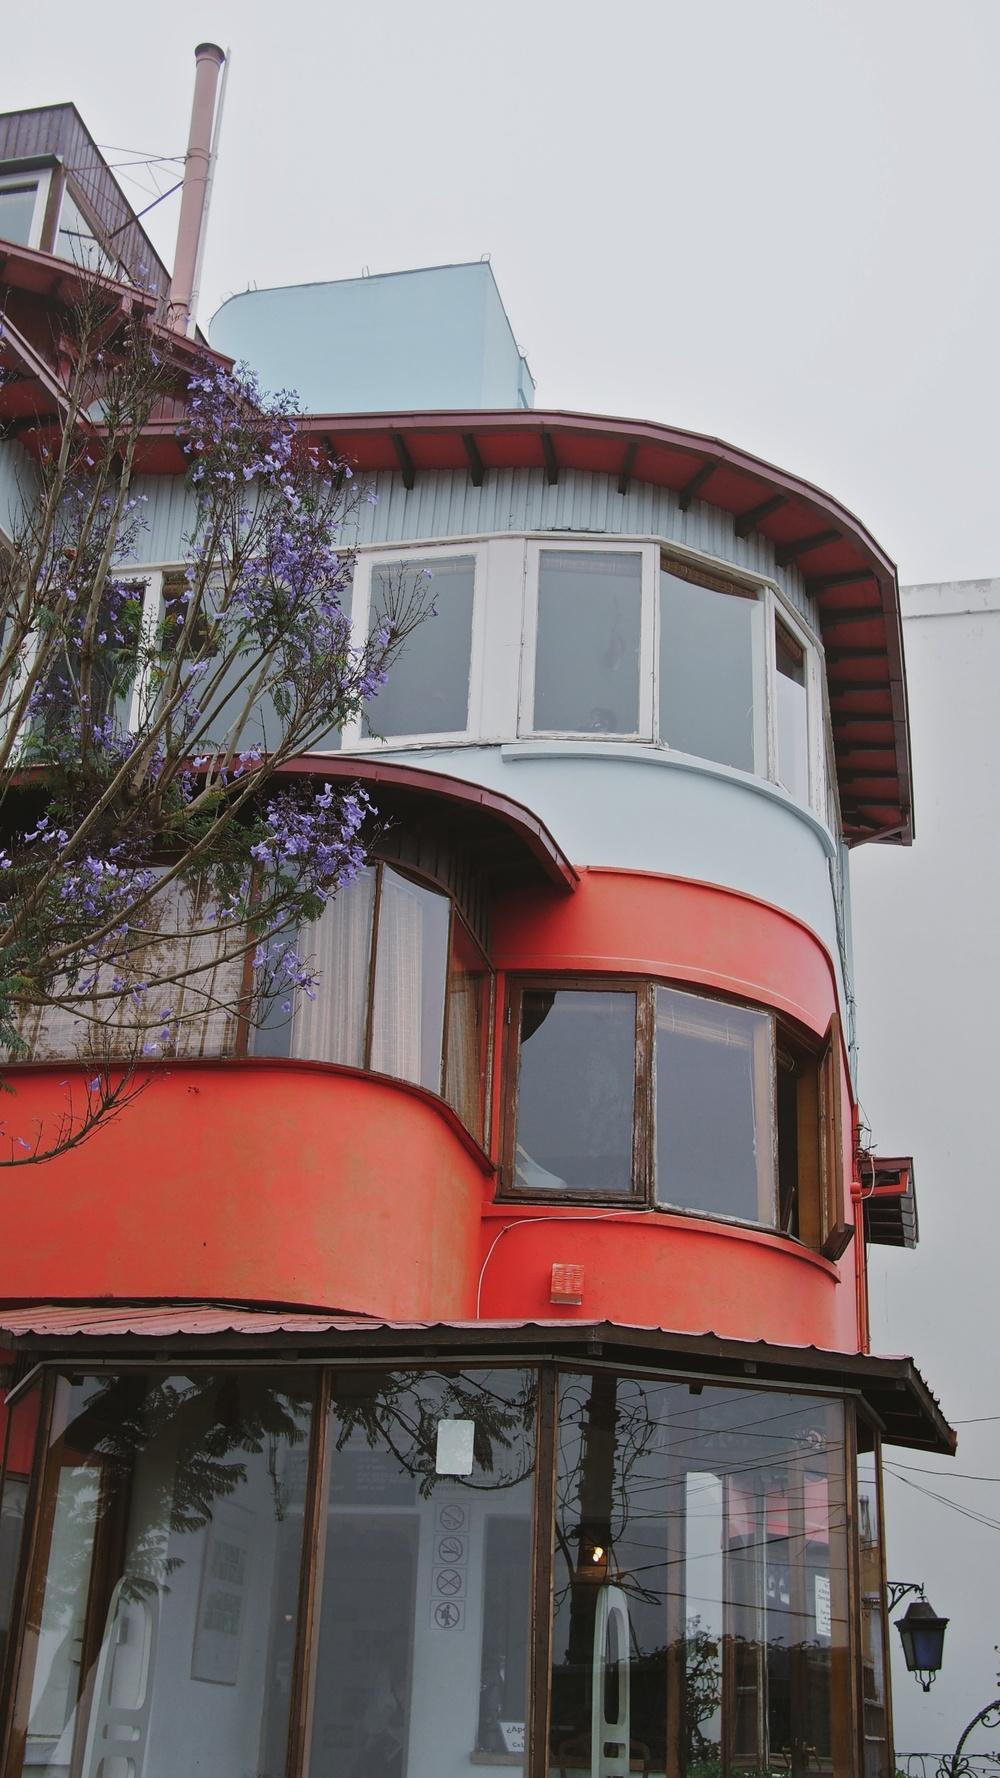 Pablo Neruda's house in Valparaíso,La Sebastiana